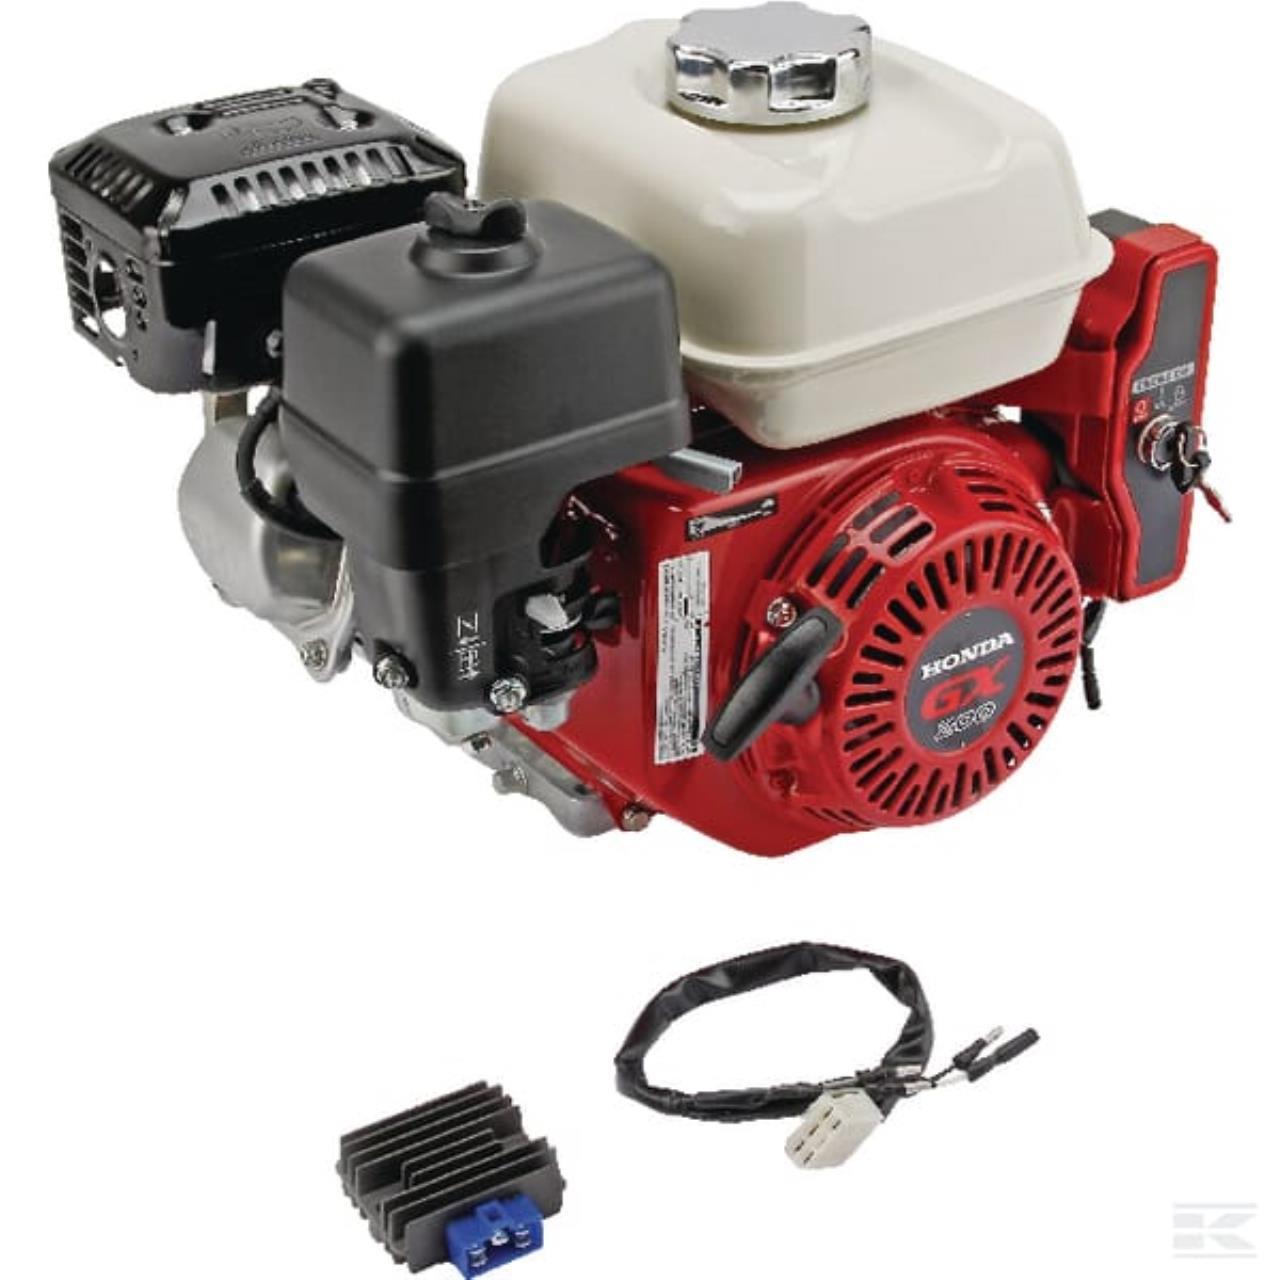 Honda benzinmotor m/el-start, 7,0 Amp ladespole